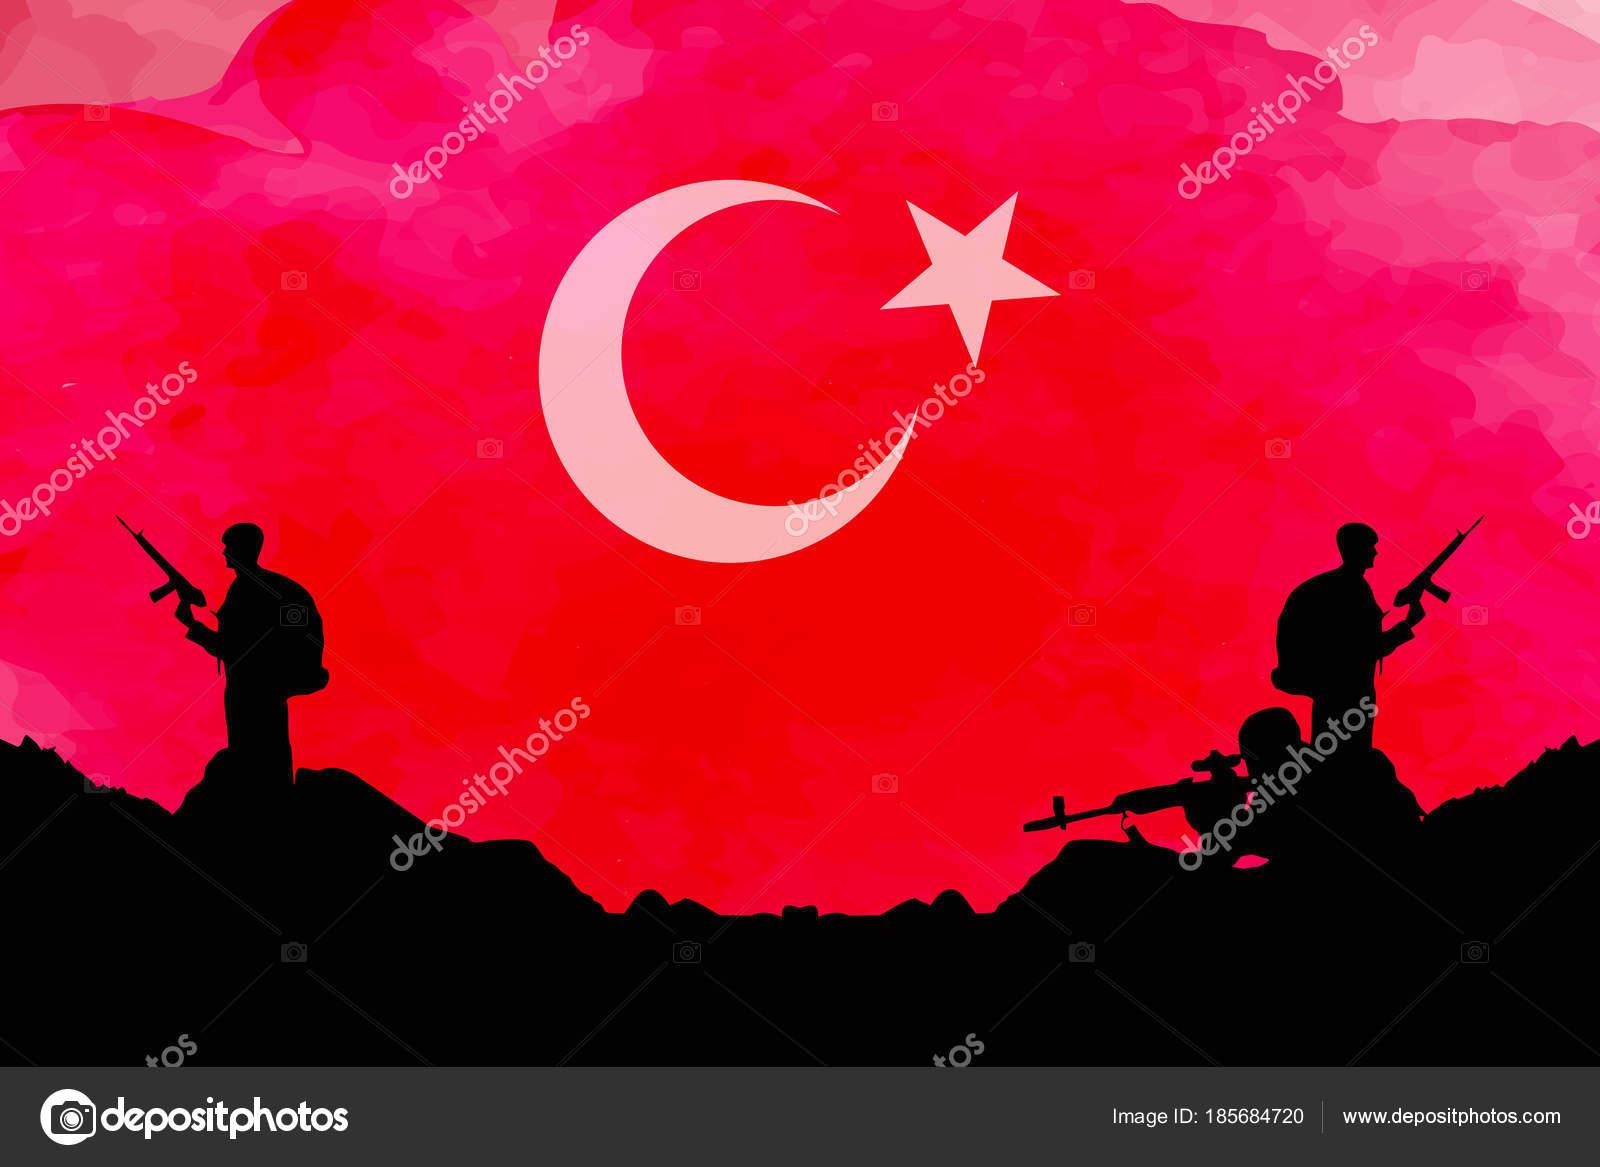 Turk Bayragi Ile Asker Siluette Stok Vektor C Ahmety34